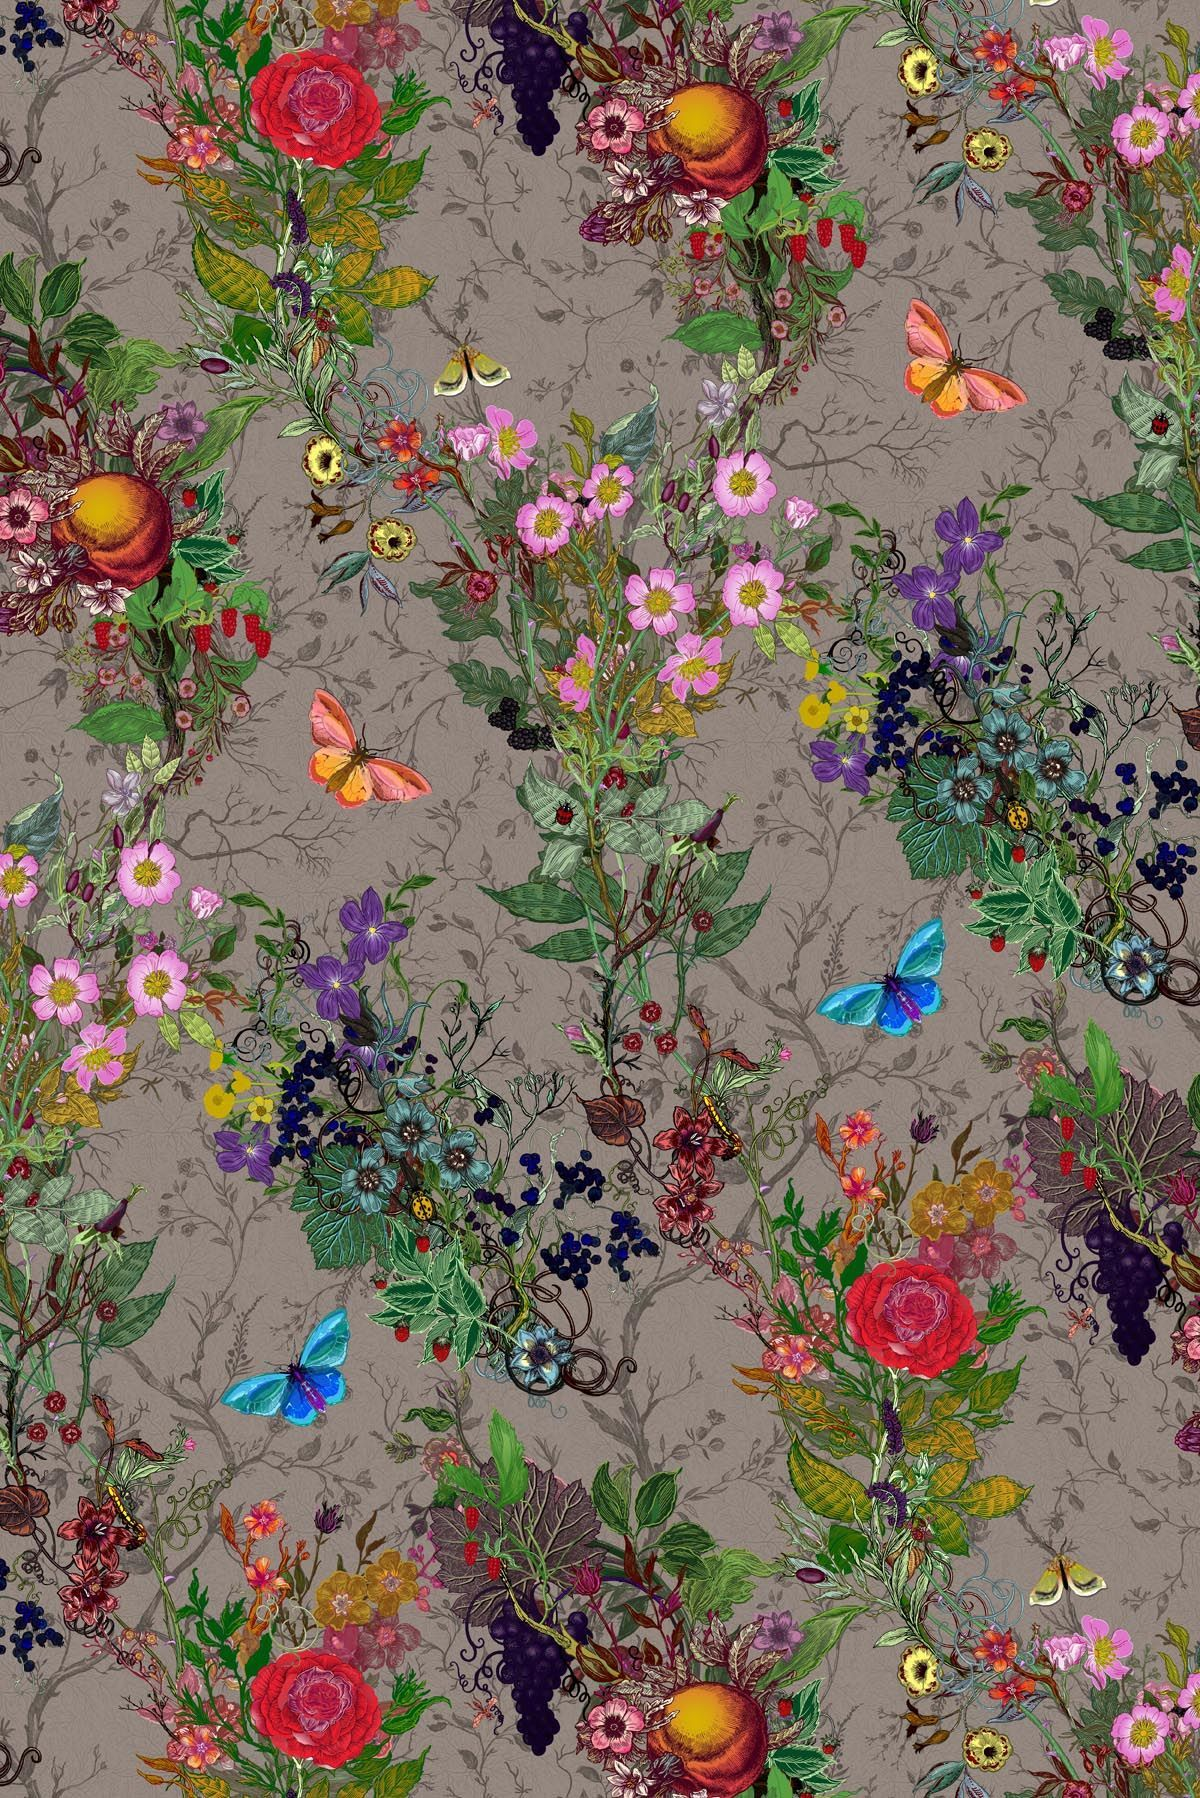 Timorous Beasties Fabric Bloomsbury Garden botanical